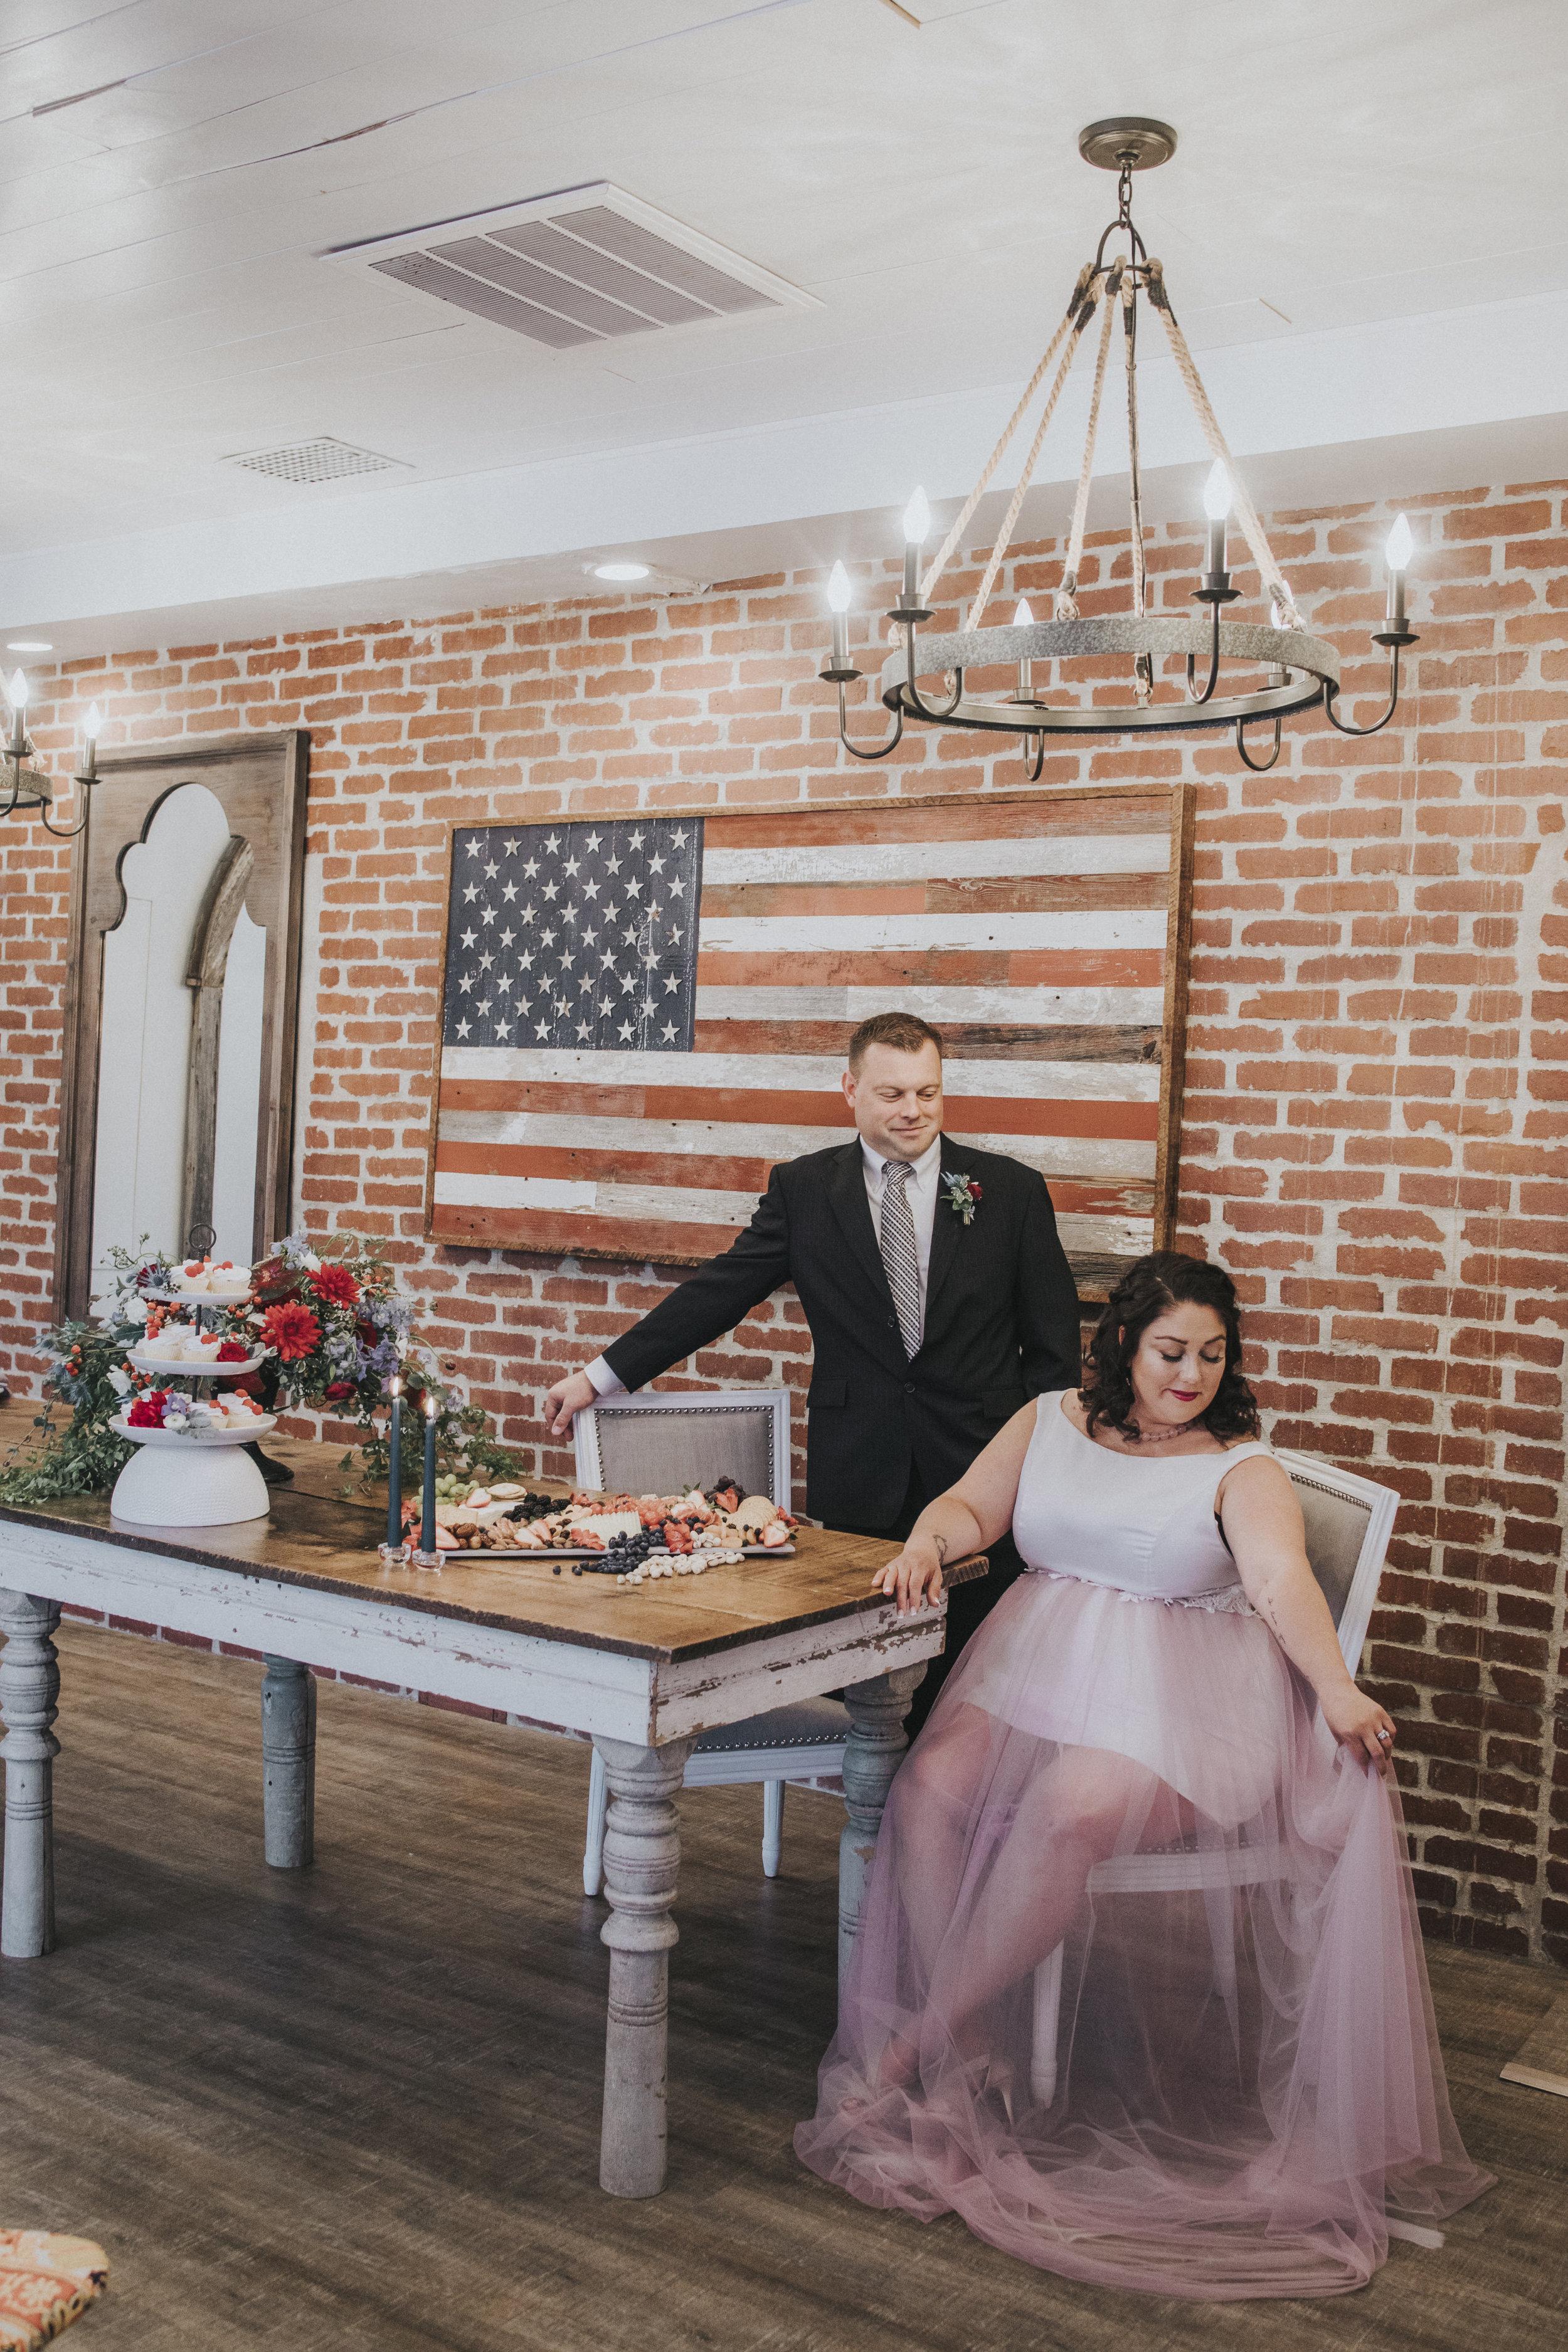 55 midwest-colorado-nebraska-elopement-photography-gretna-turtledoves.jpg